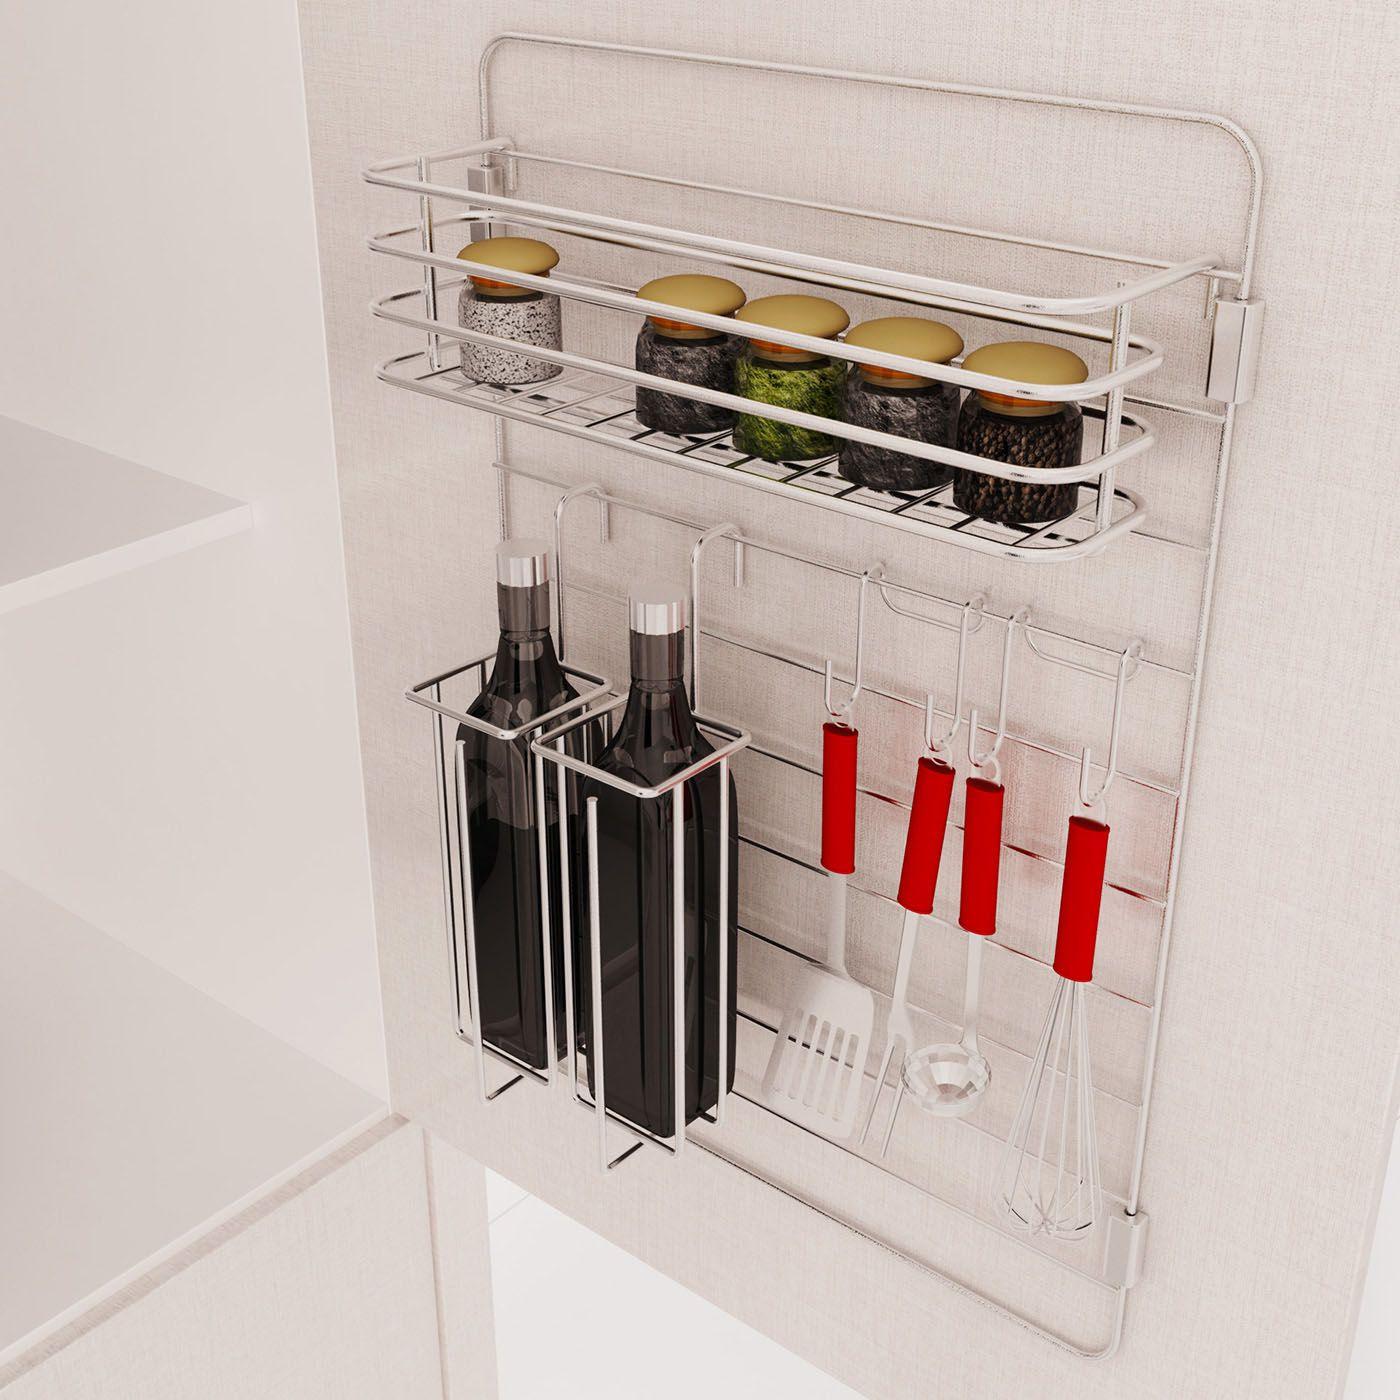 Aéreo Componível - Porta Condimentos, Porta Azeite duplo, Porta Talheres Duplo